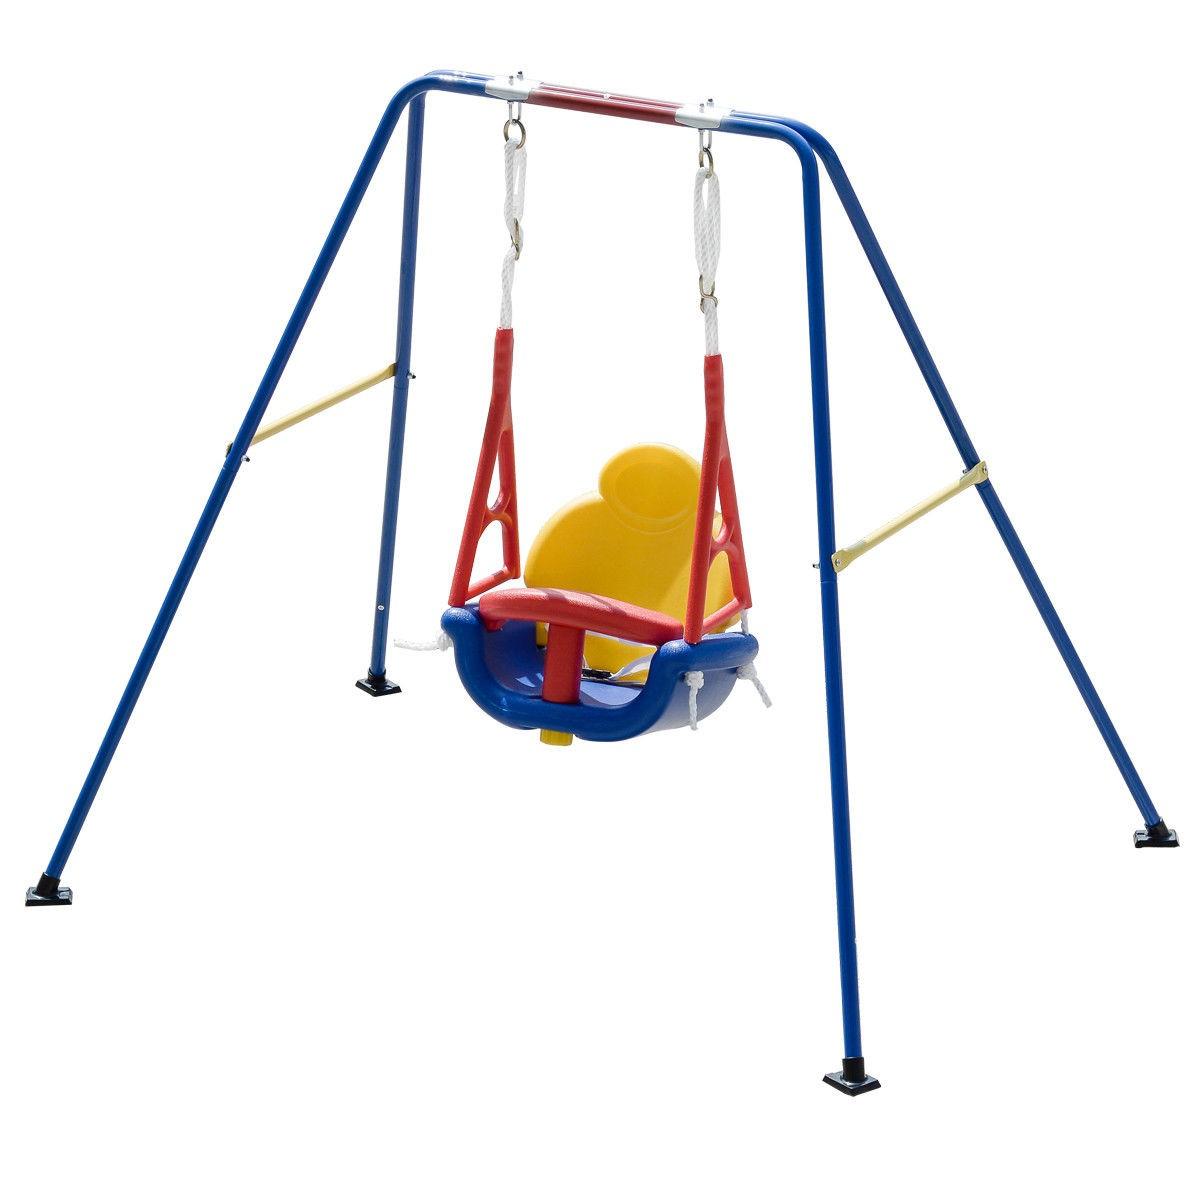 Costway A-Frame Kids 3-in-1 Toddler Swing Set $67.95 + Free Shipping